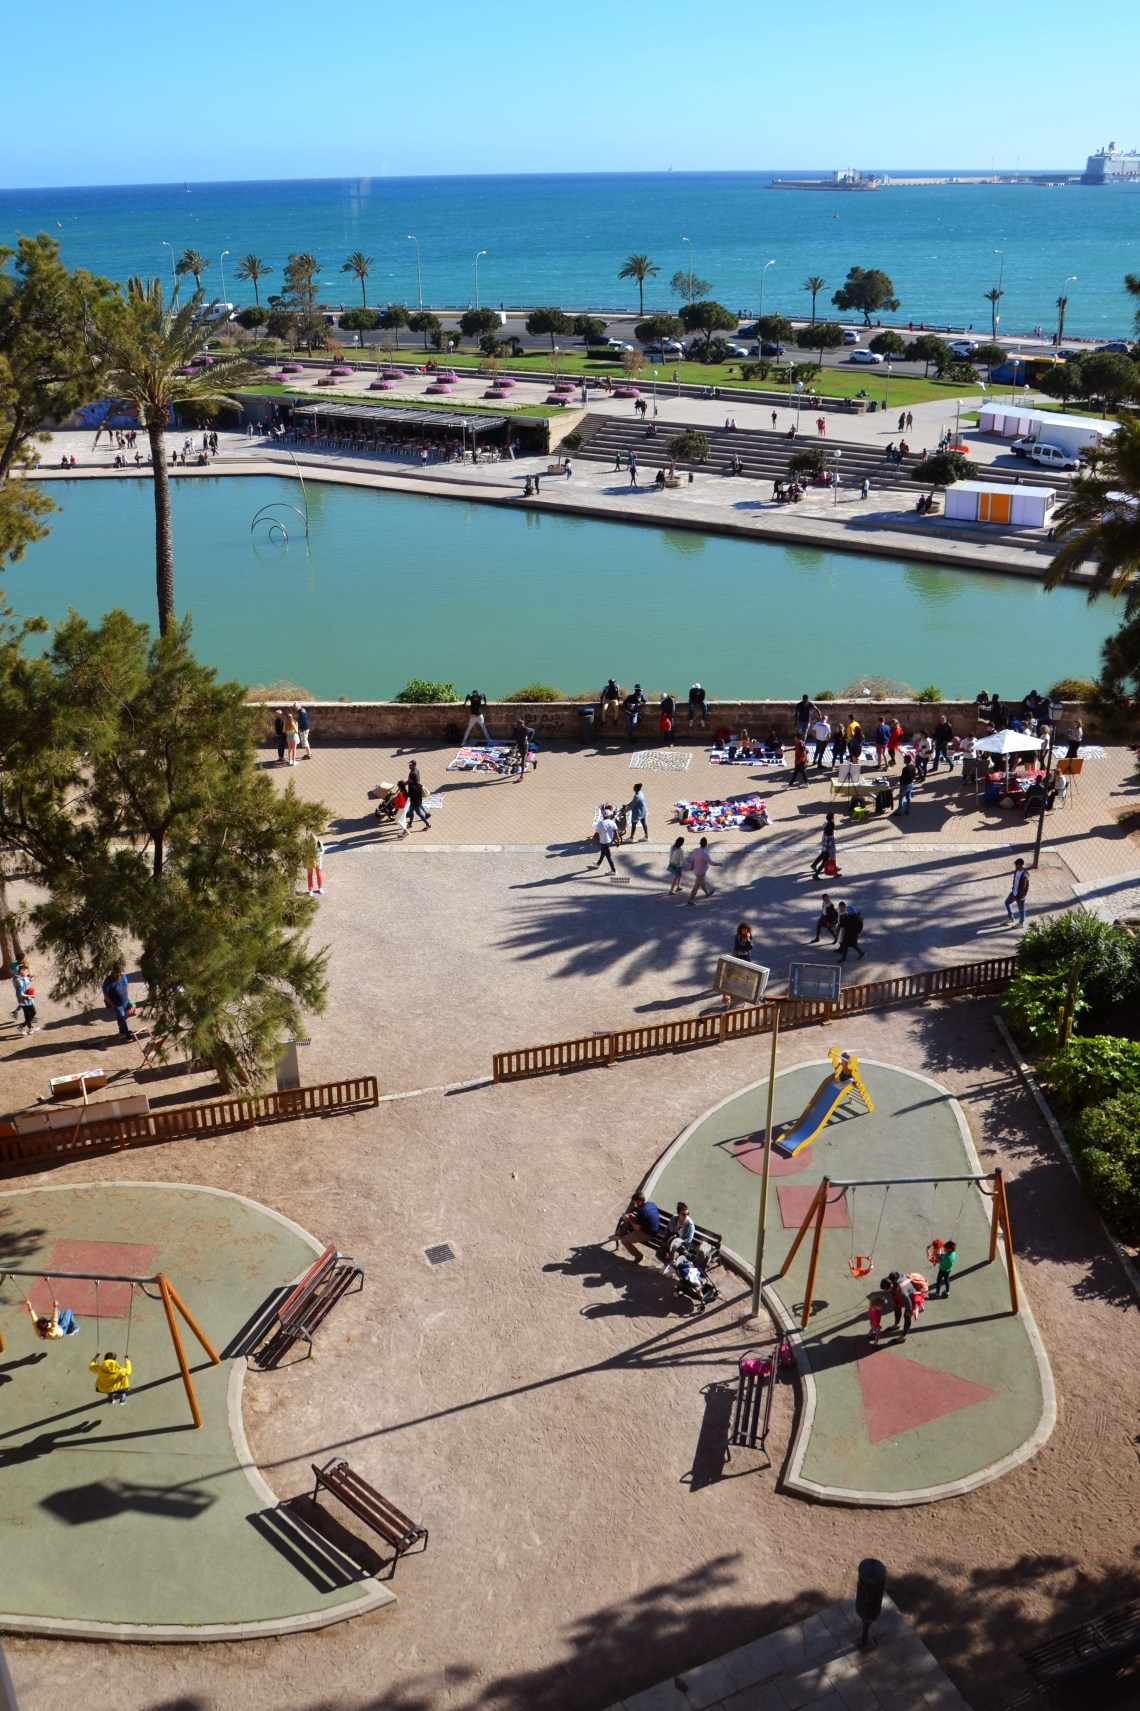 parque del mar - palma de maiorca - turismo